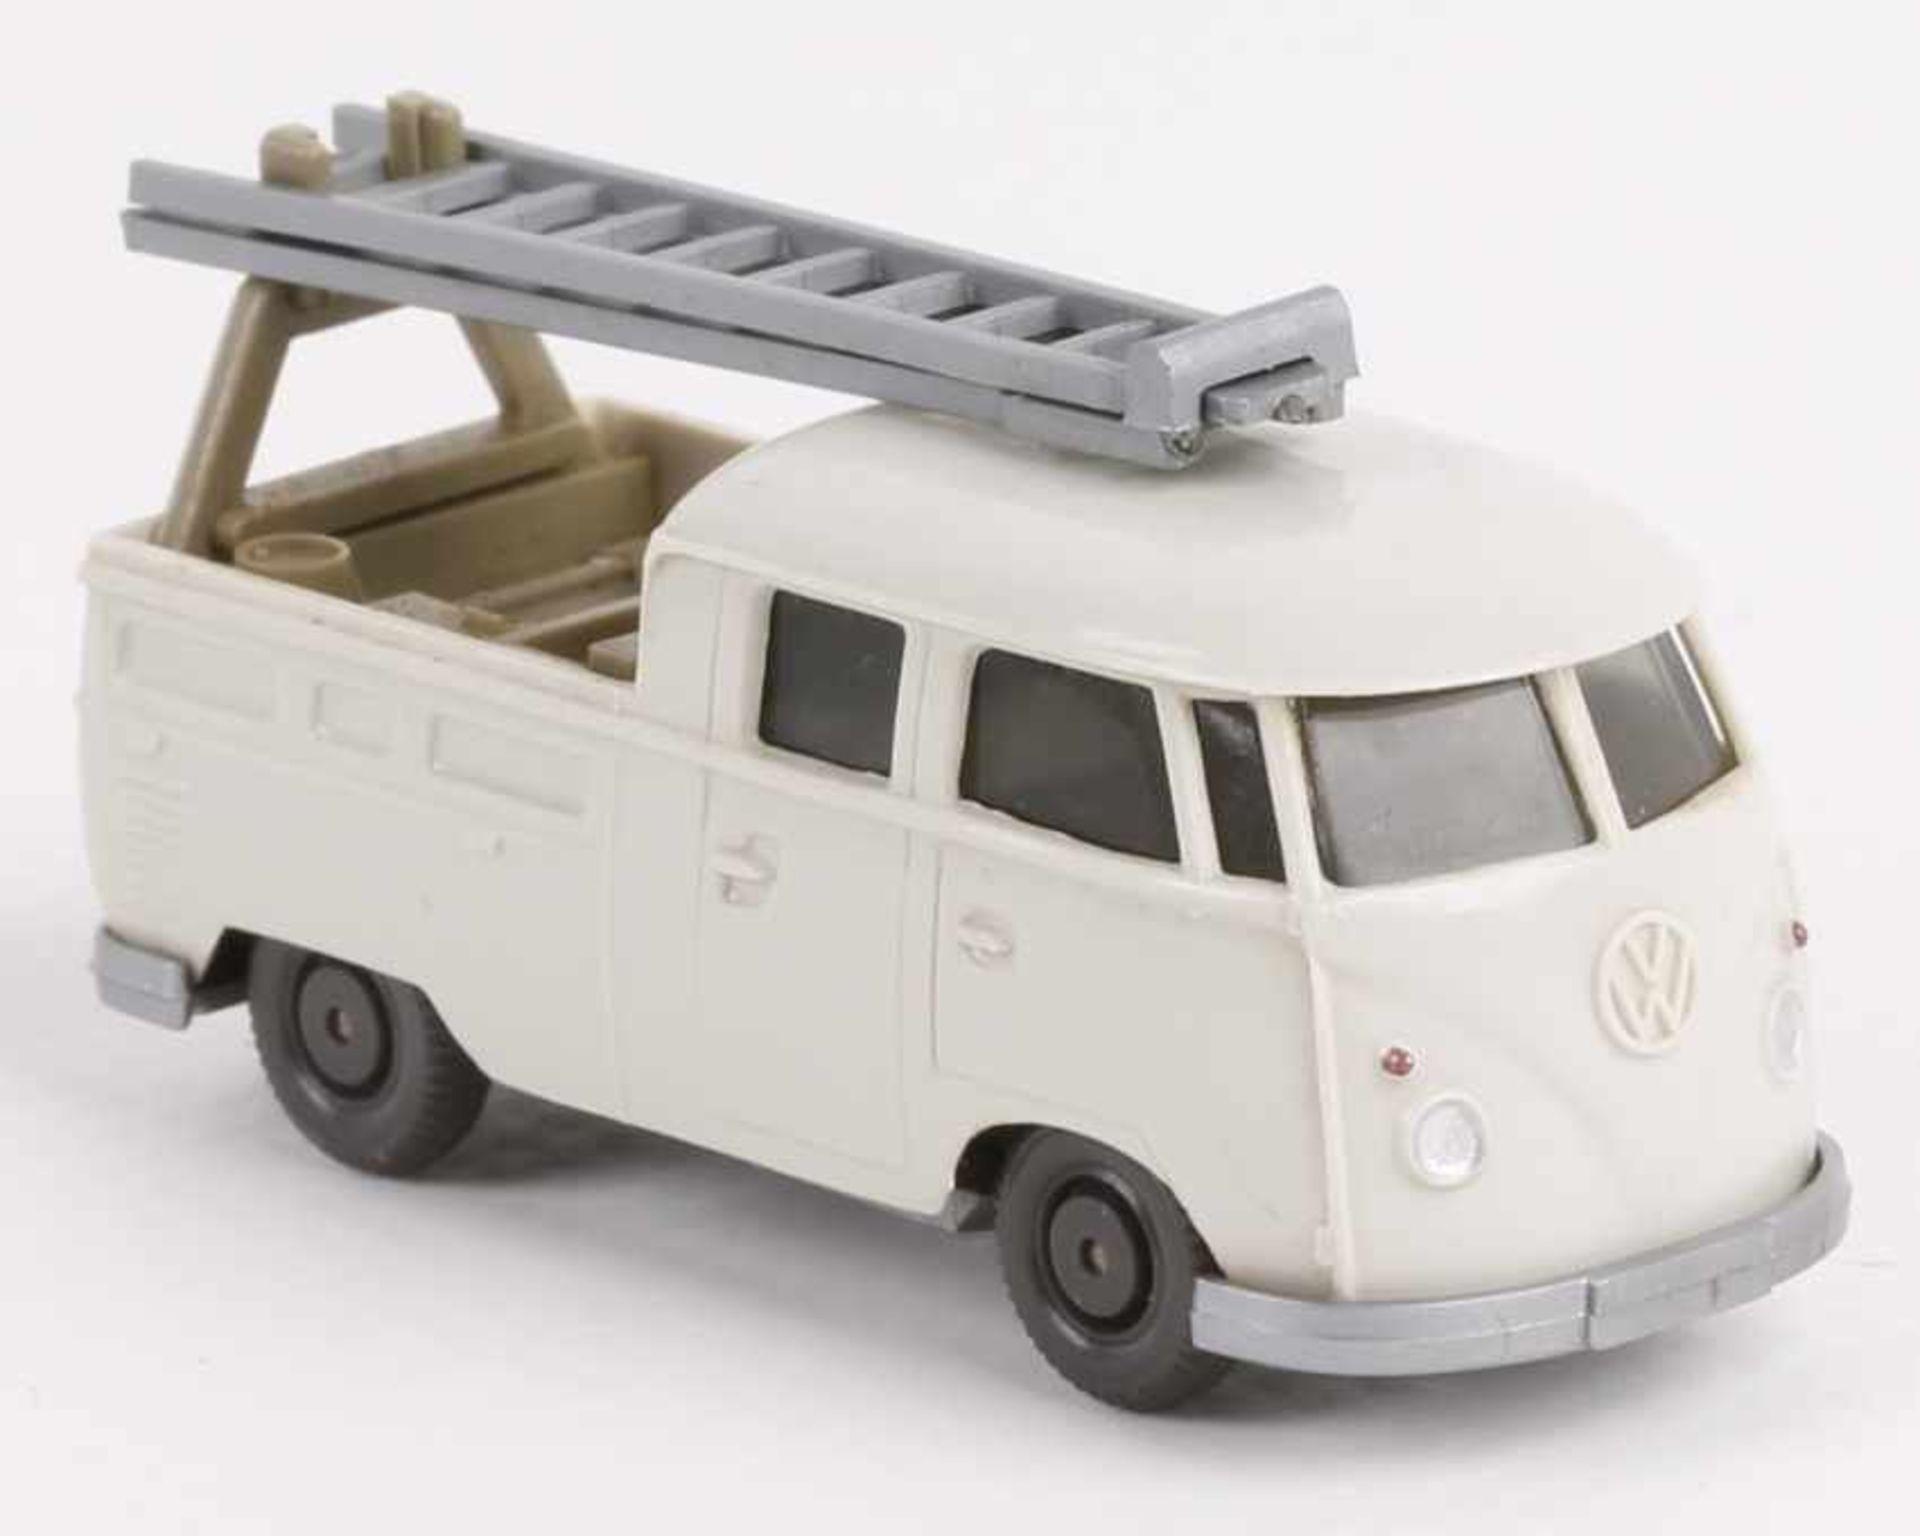 Los 1041 - WikingVW Montagewagen perlweiß296/1g, Steg bb, neuwertig